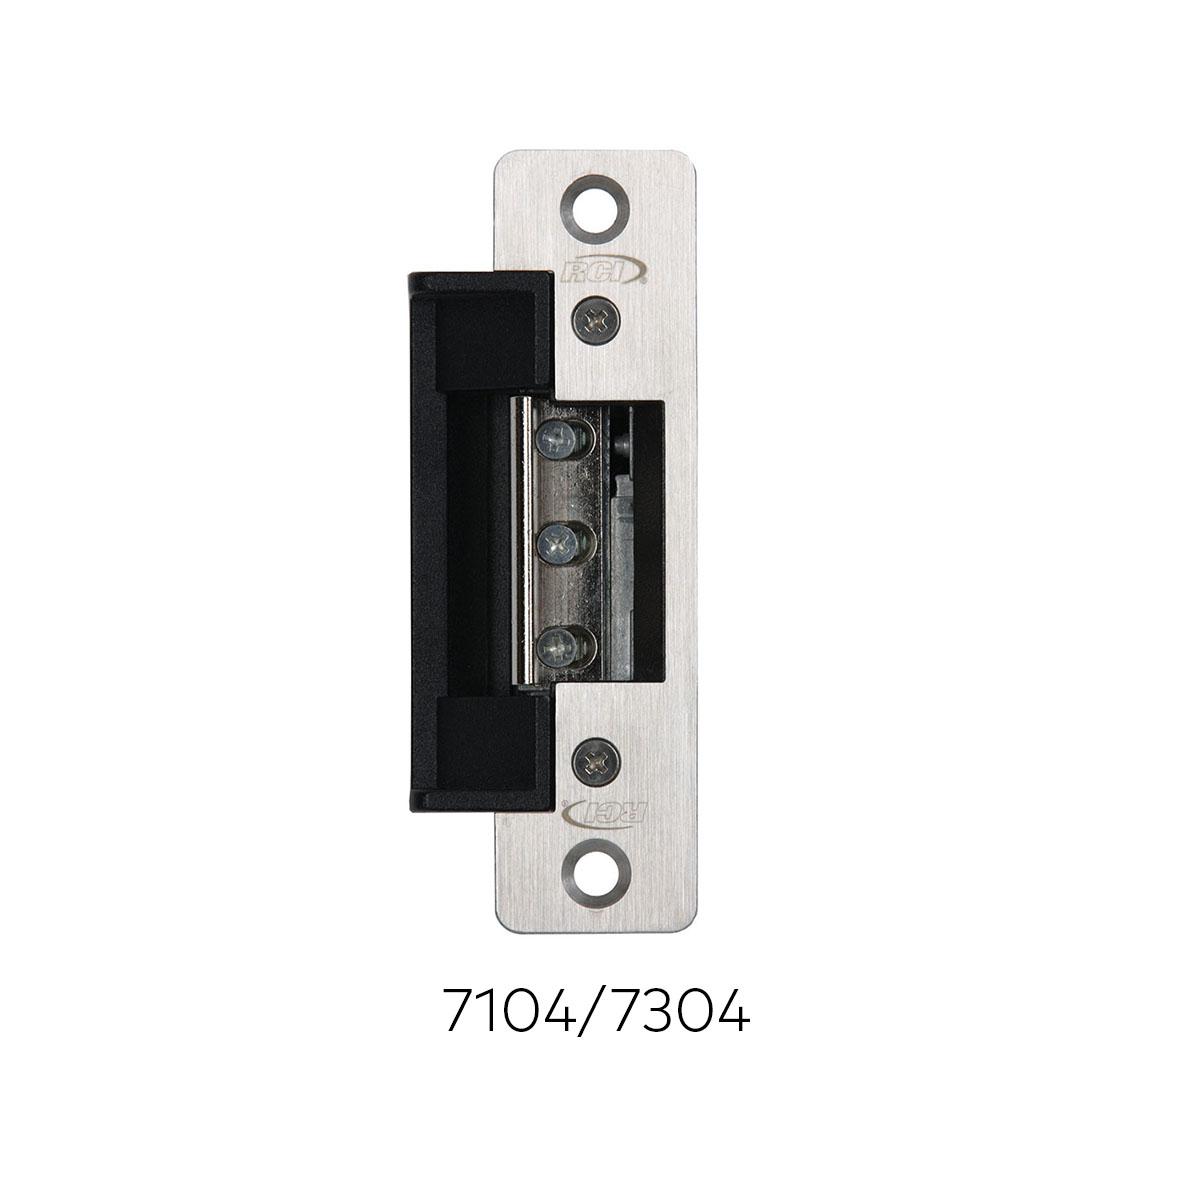 7 Series Centerline Electric Strikes Rci Dormakaba Strike Door Lock Wiring Diagram Harness 7104 7304 Ead